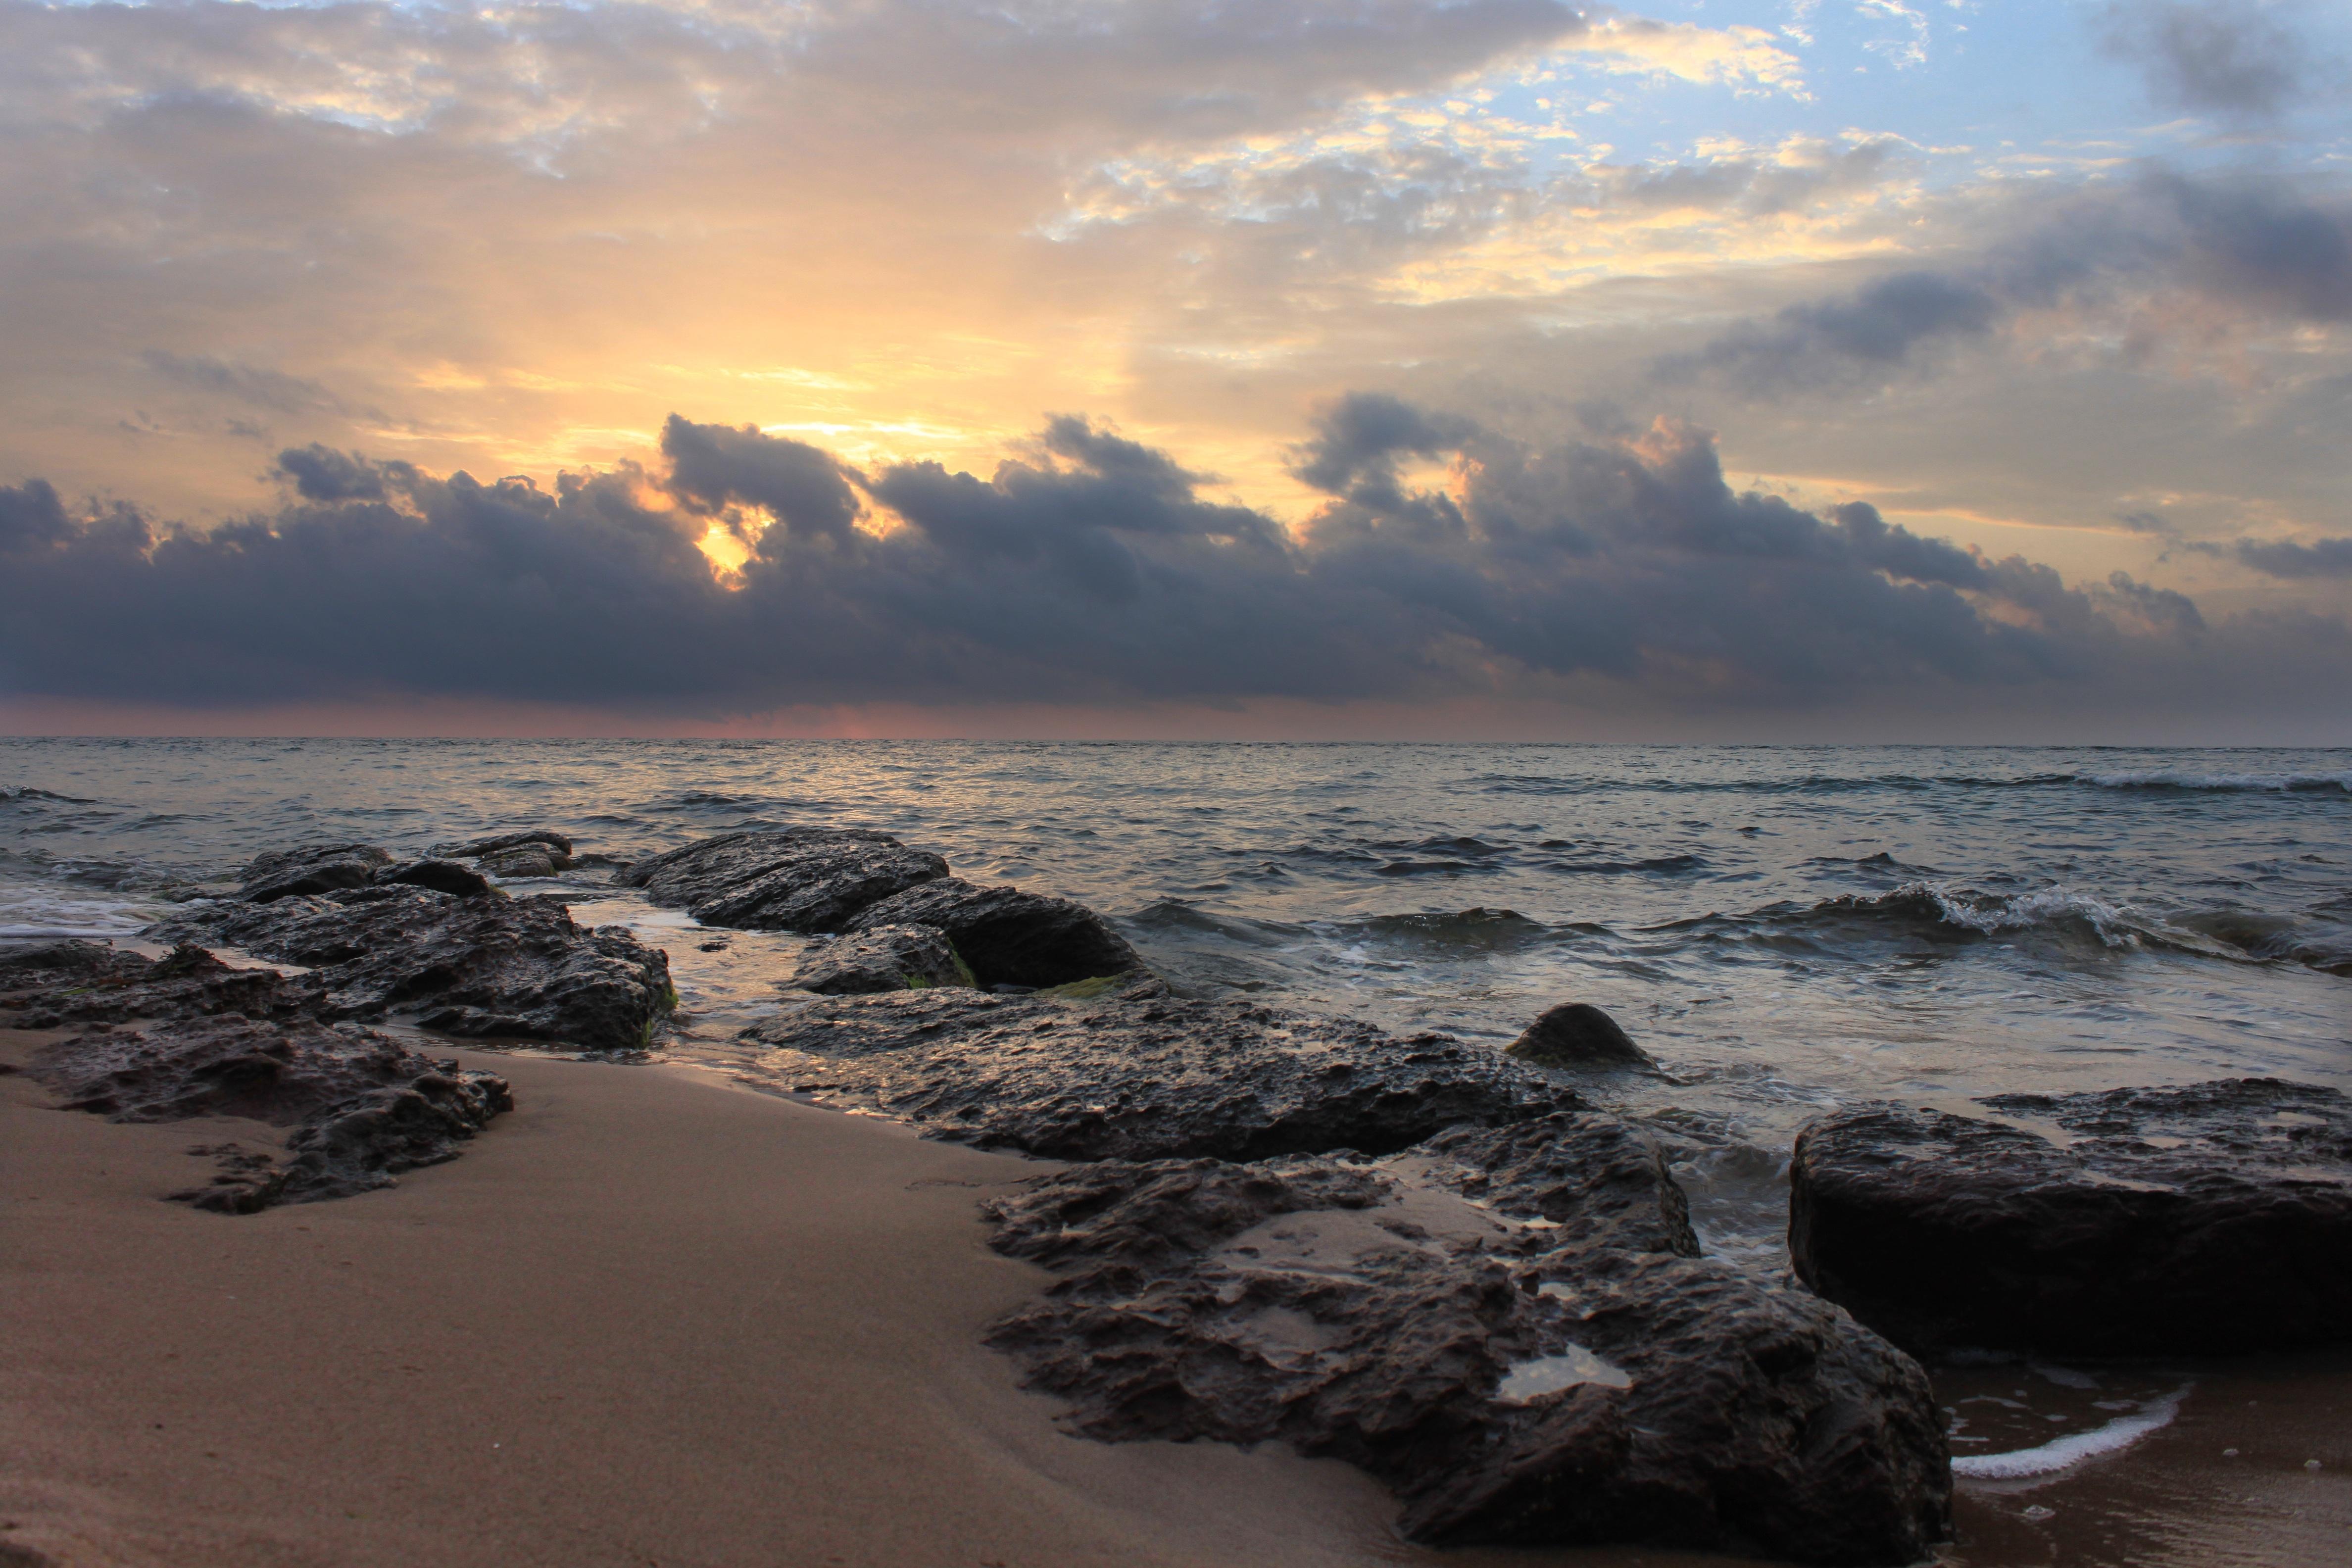 картинки день на берегу моря зыбин рыбалку форель